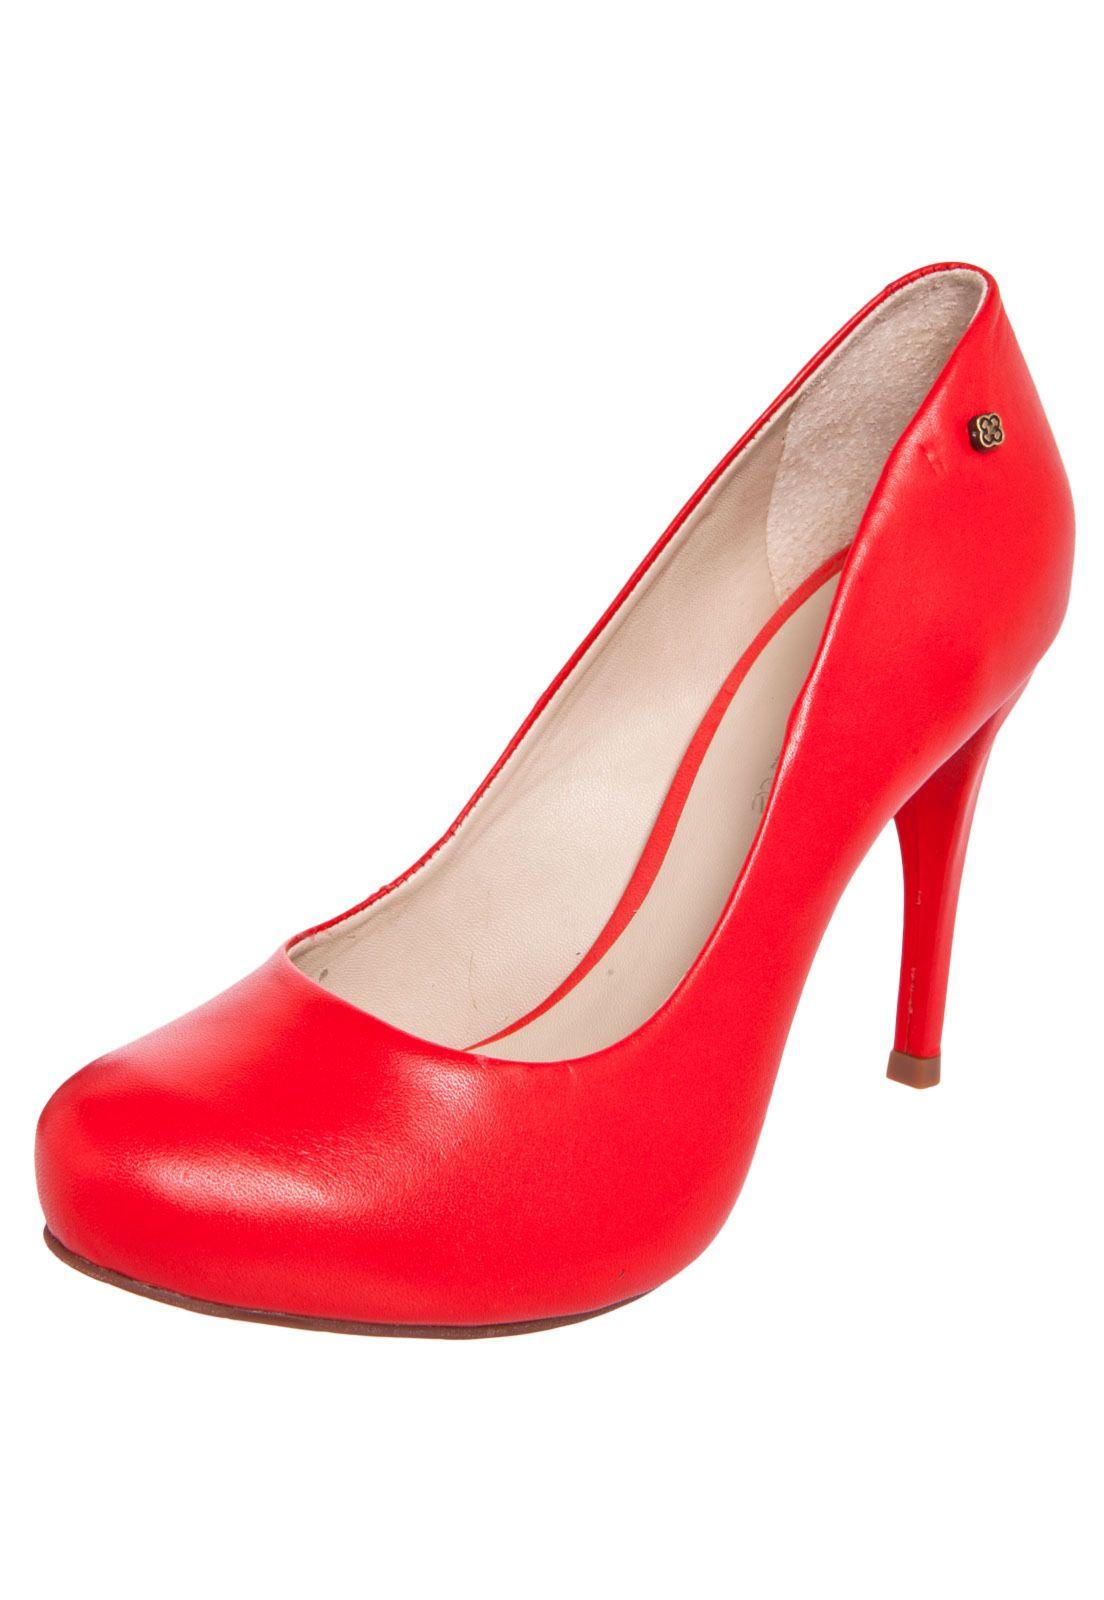 6acfacf68 Scarpin Capodarte Salto Alto Bico Redondo Vermelho - Compre Agora   Dafiti  Brasil